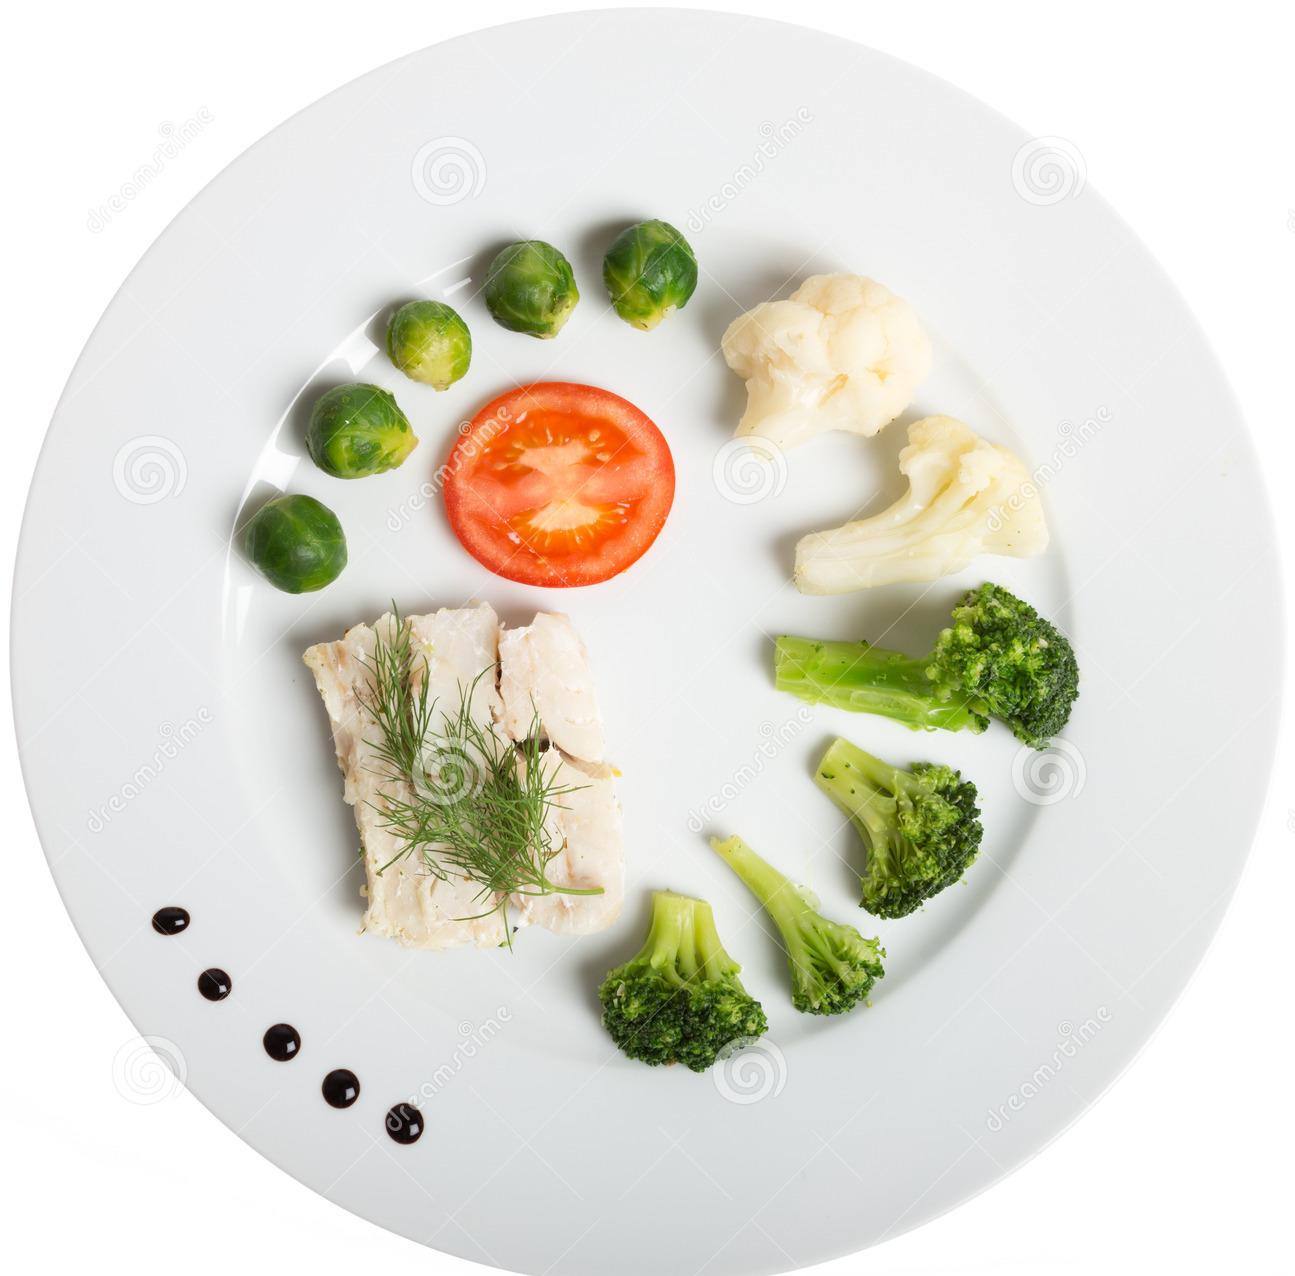 Dietas De Baixo Teor De Gordura S O Recheadas De Equ Vocos